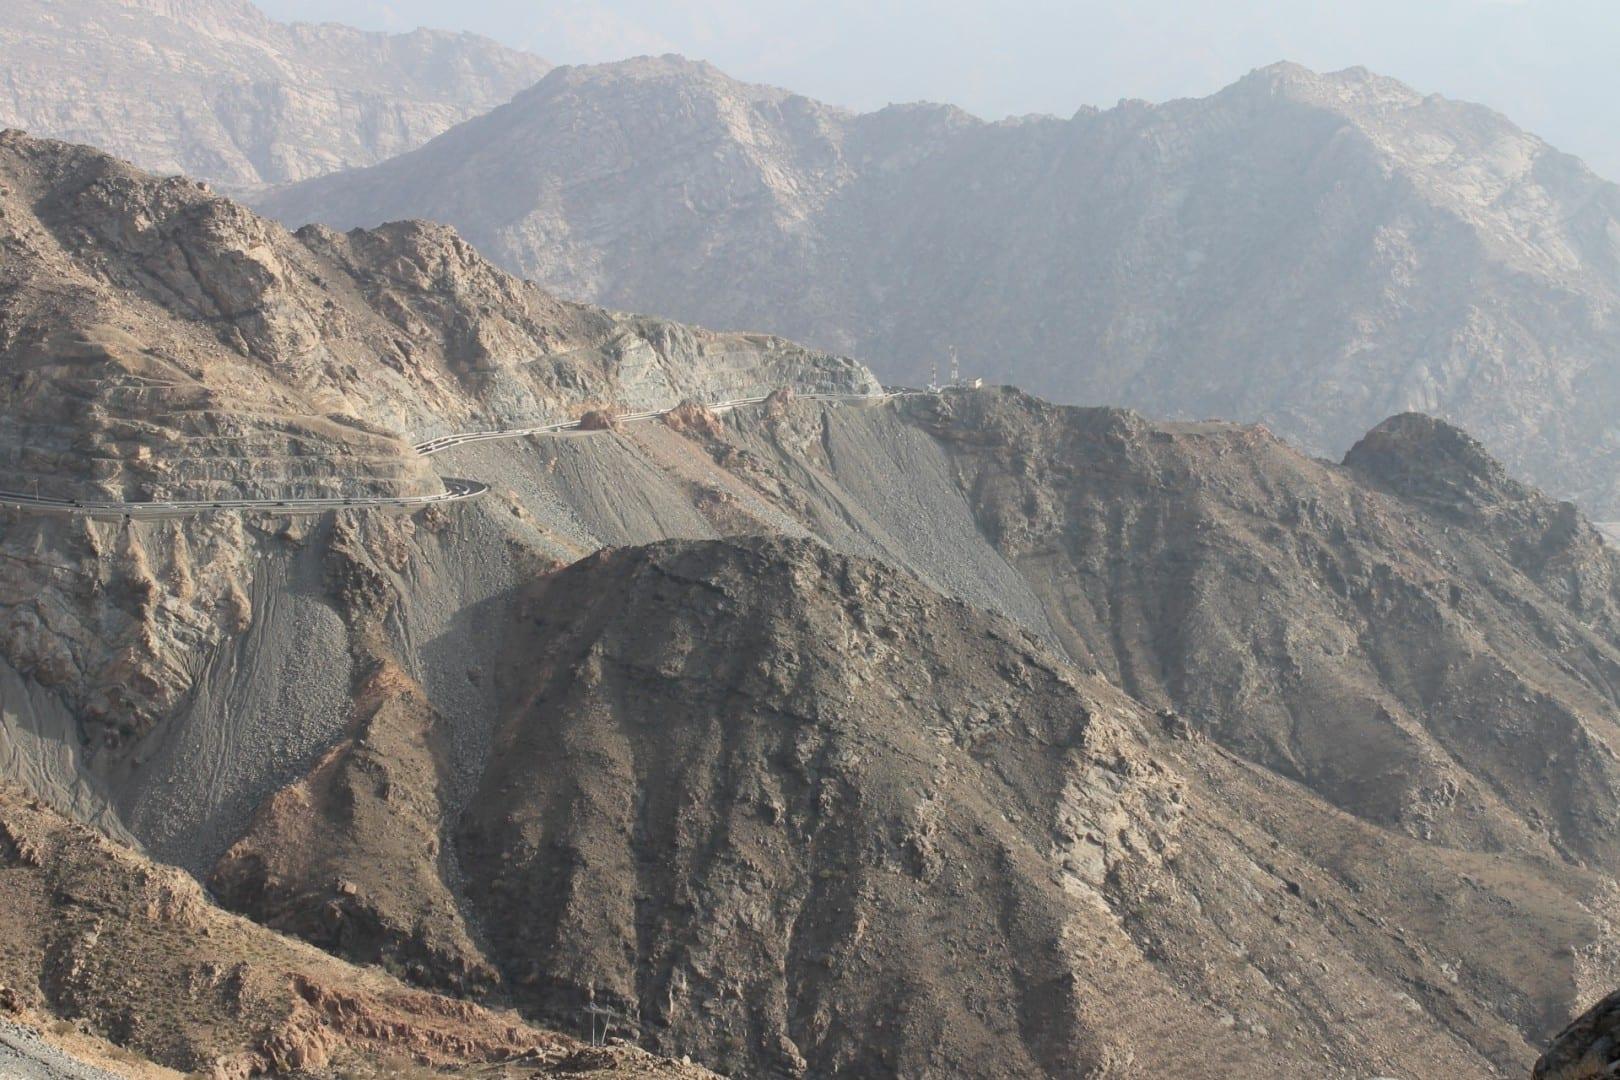 Las montañas cerca de Taif Taif Arabia Saudí